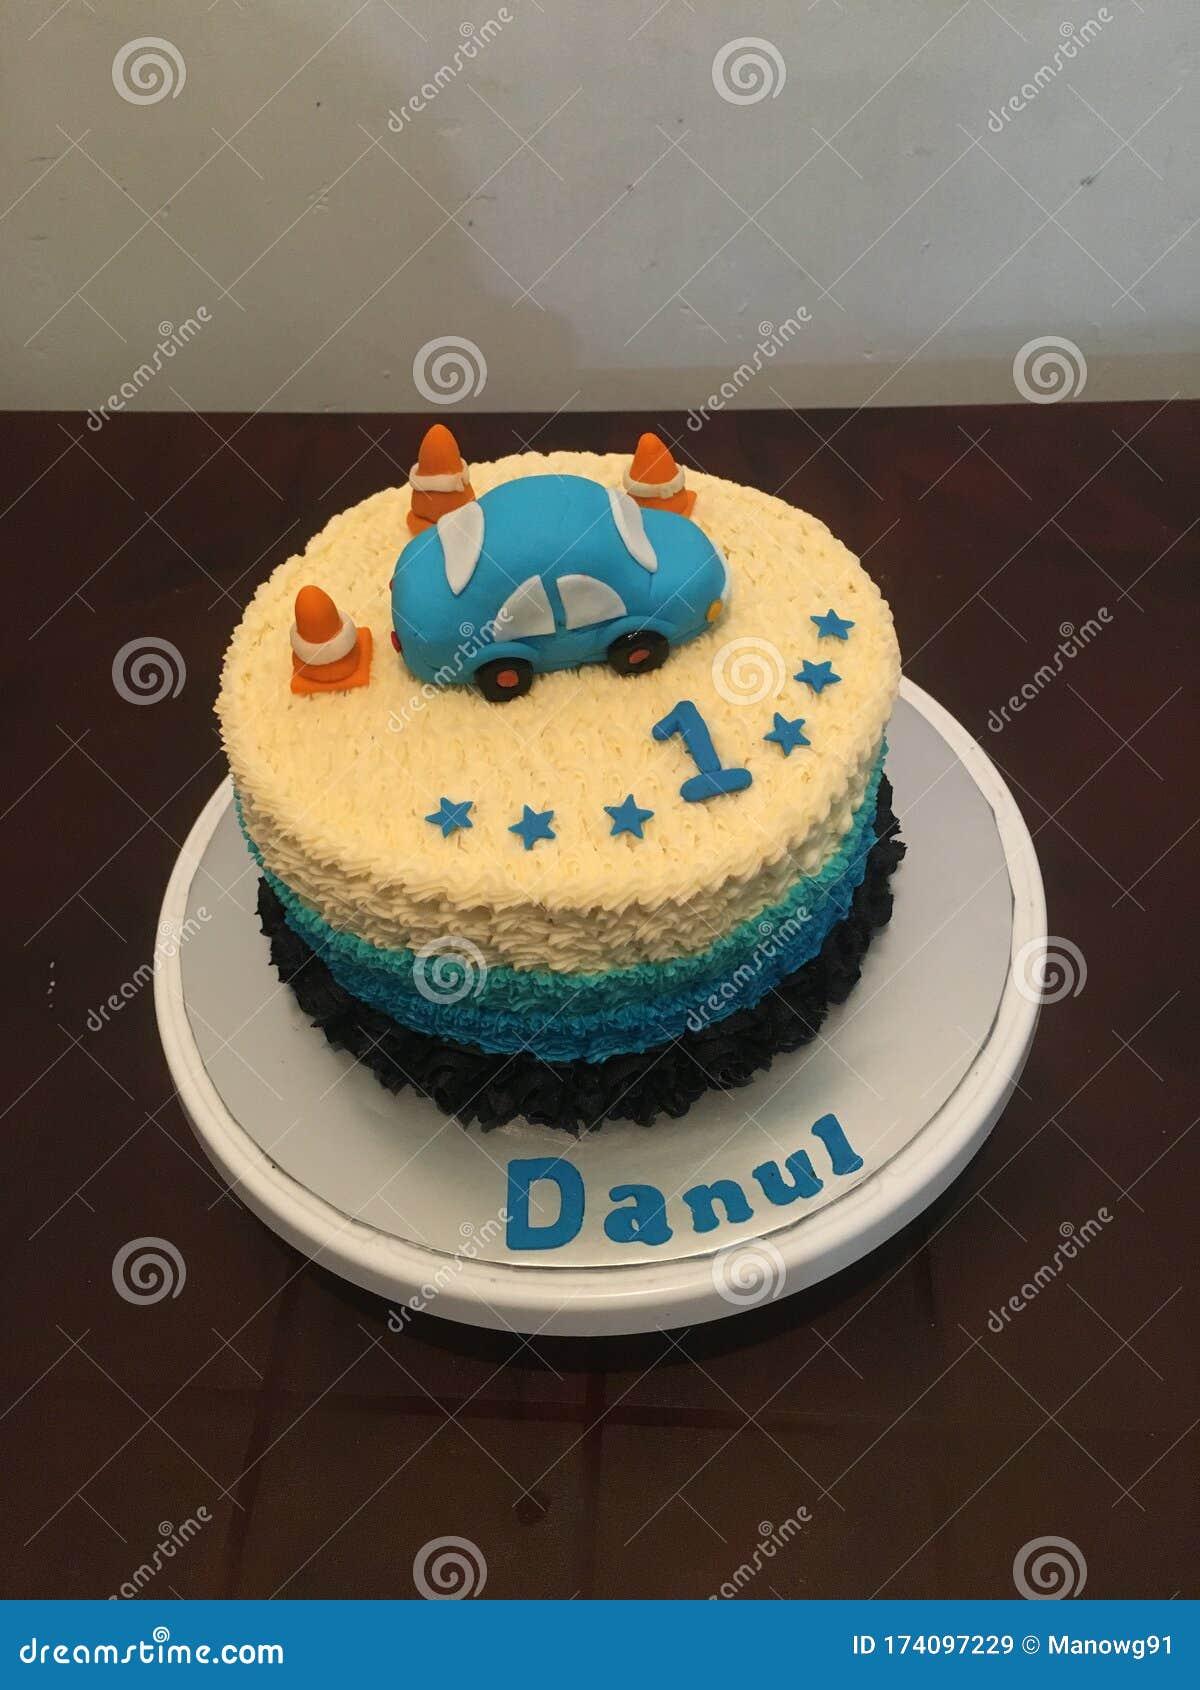 Awe Inspiring Birthday Cake For Baby Boy Stock Image Image Of Baby 174097229 Birthday Cards Printable Opercafe Filternl